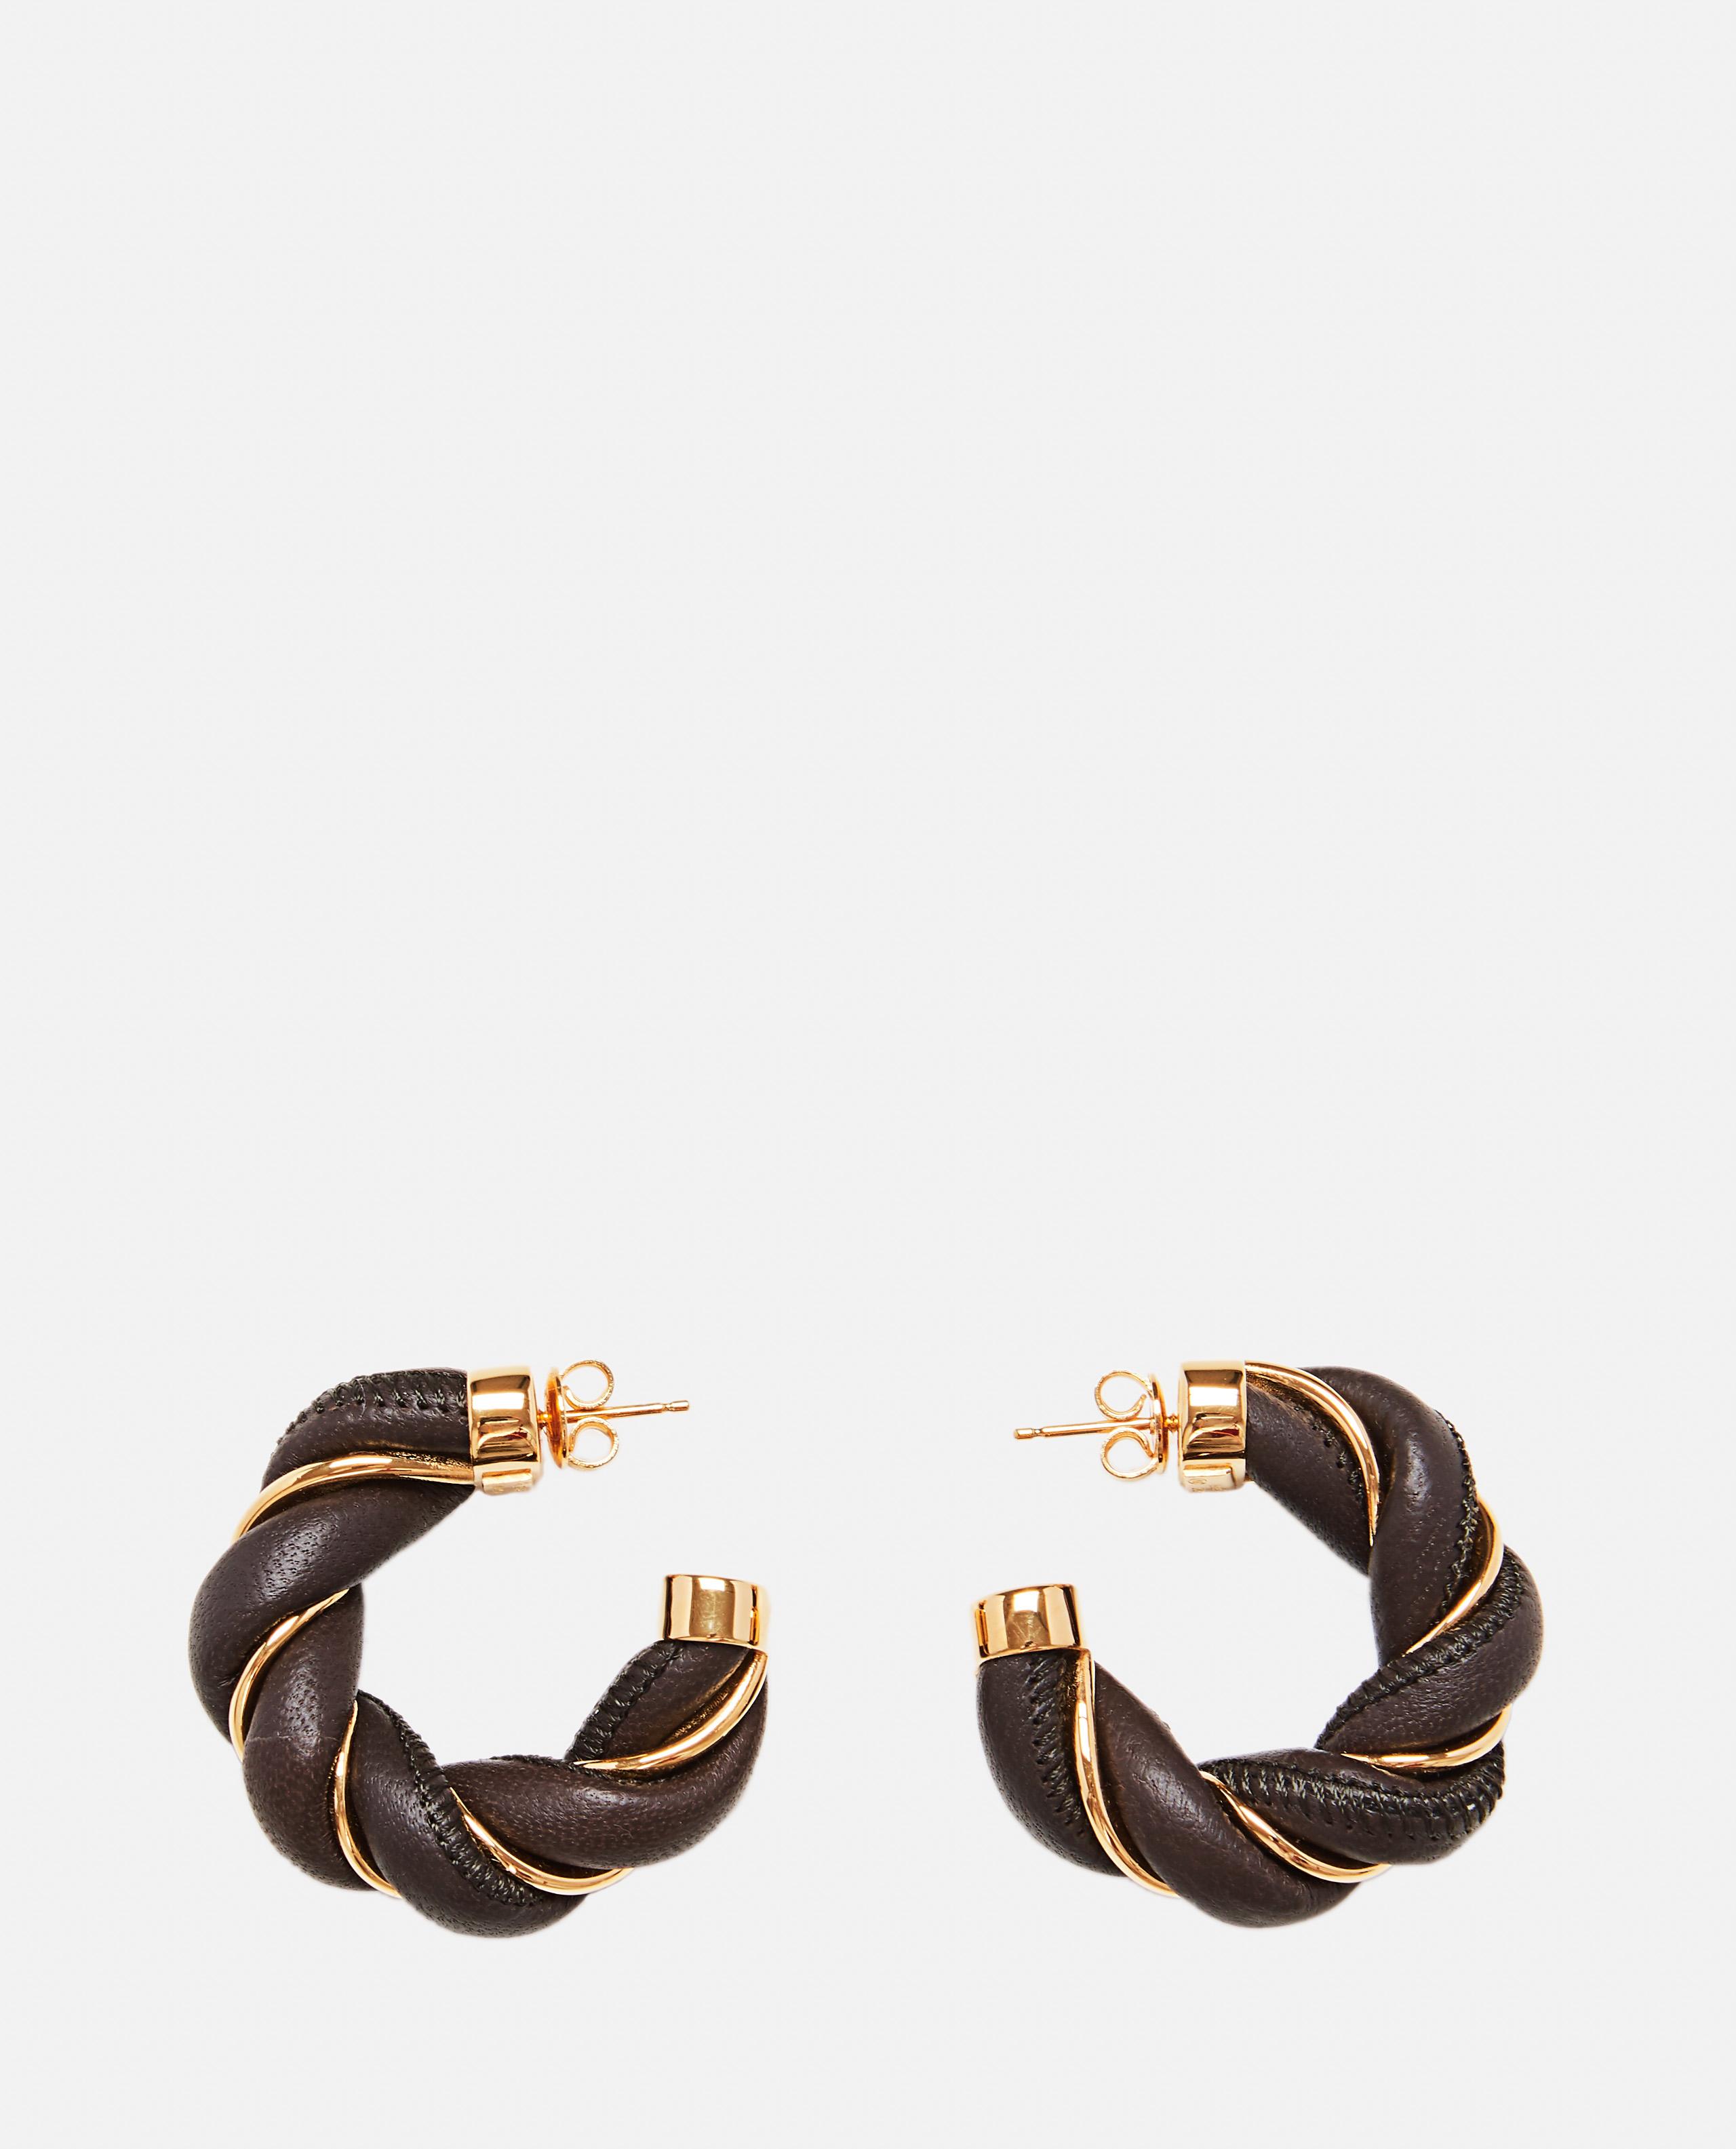 Braided leather earrings